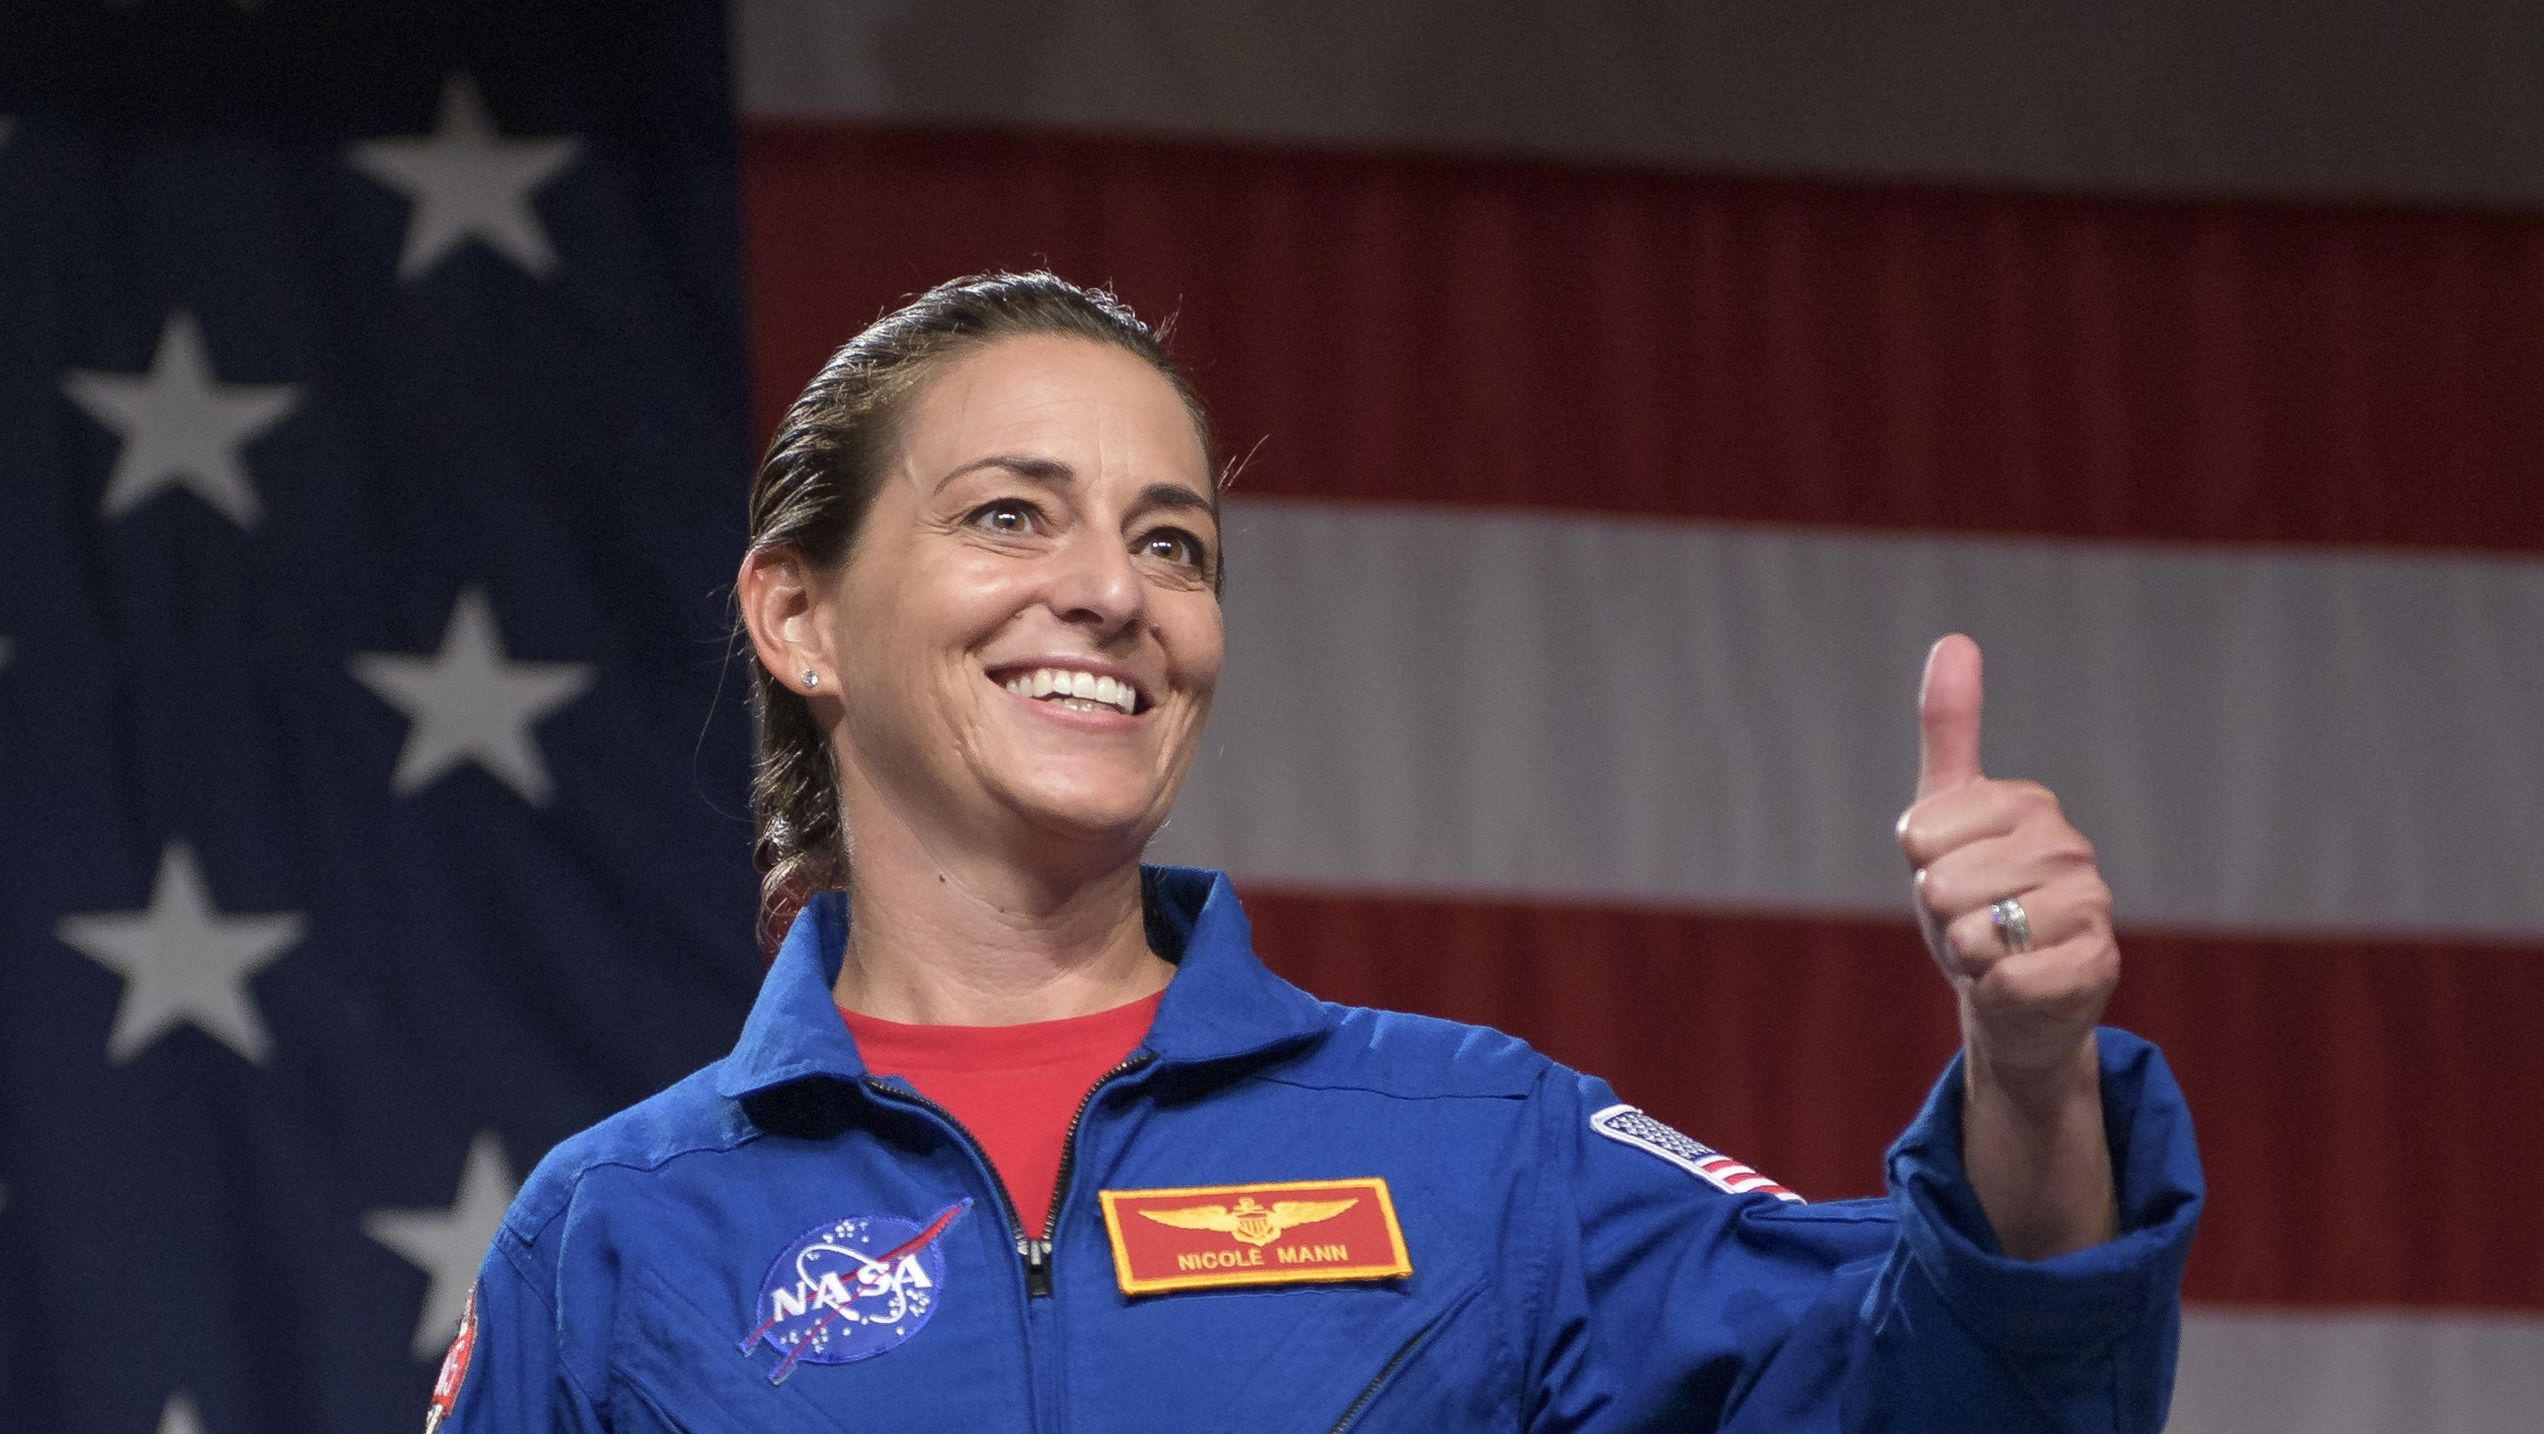 NASA astronaut Nicole Aunapu Mann at an event in August 2018